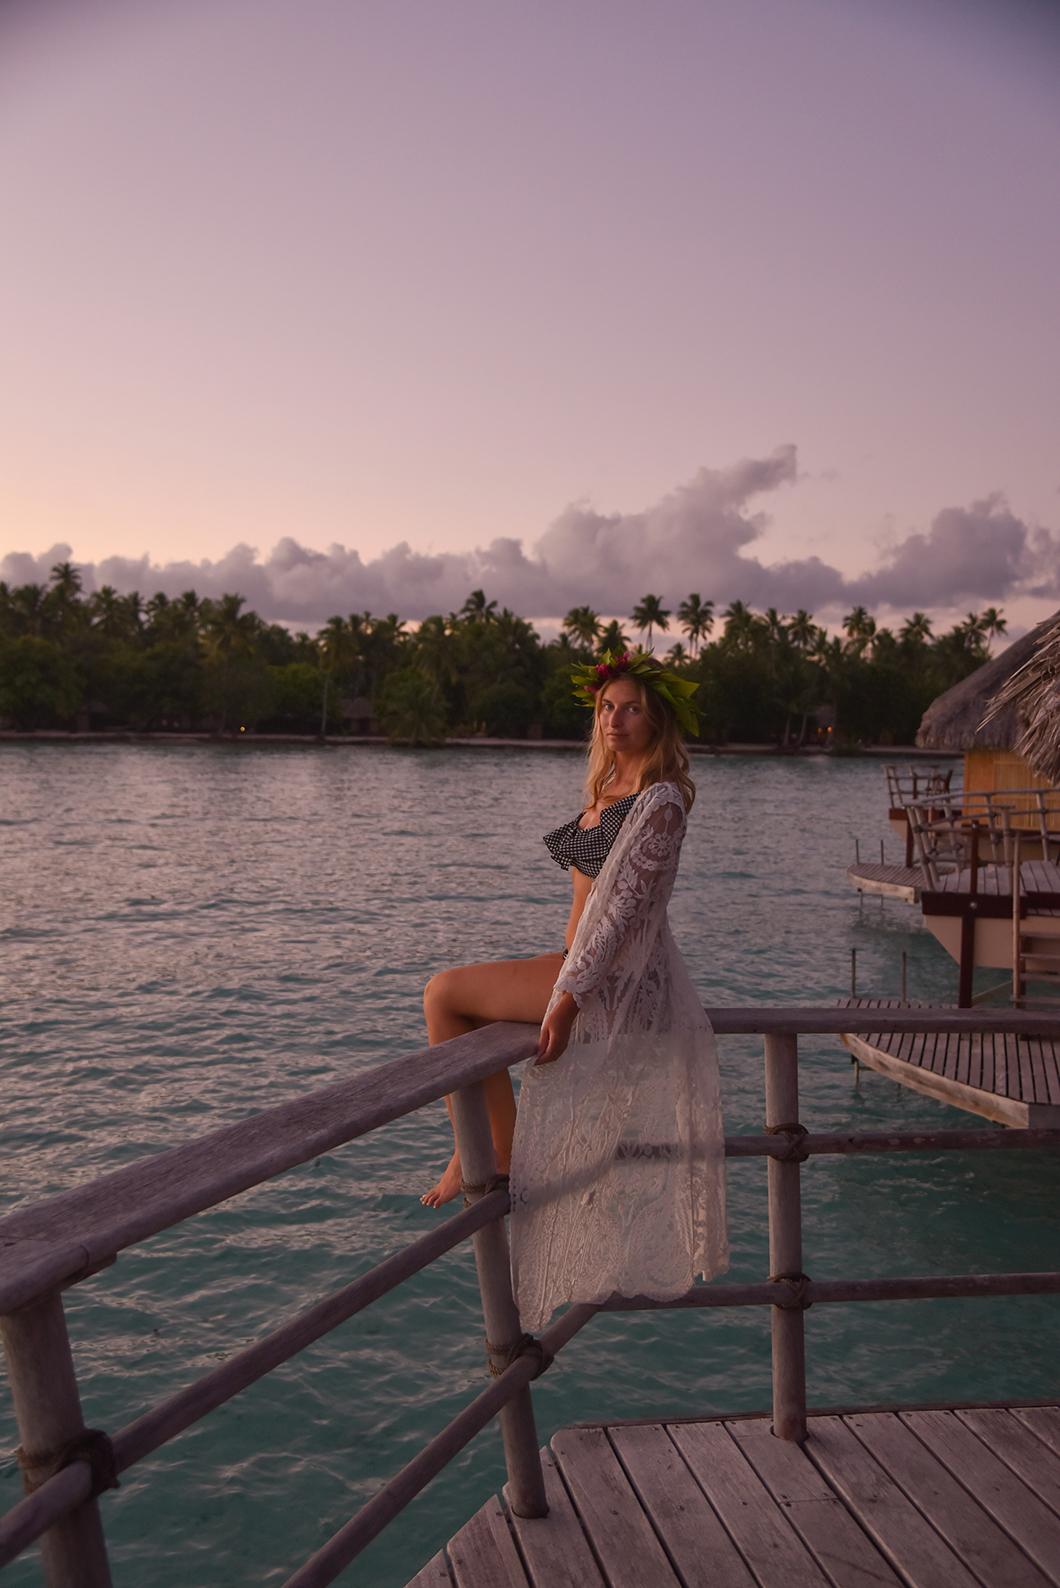 Taha'a, incontournable en Polynésie Française